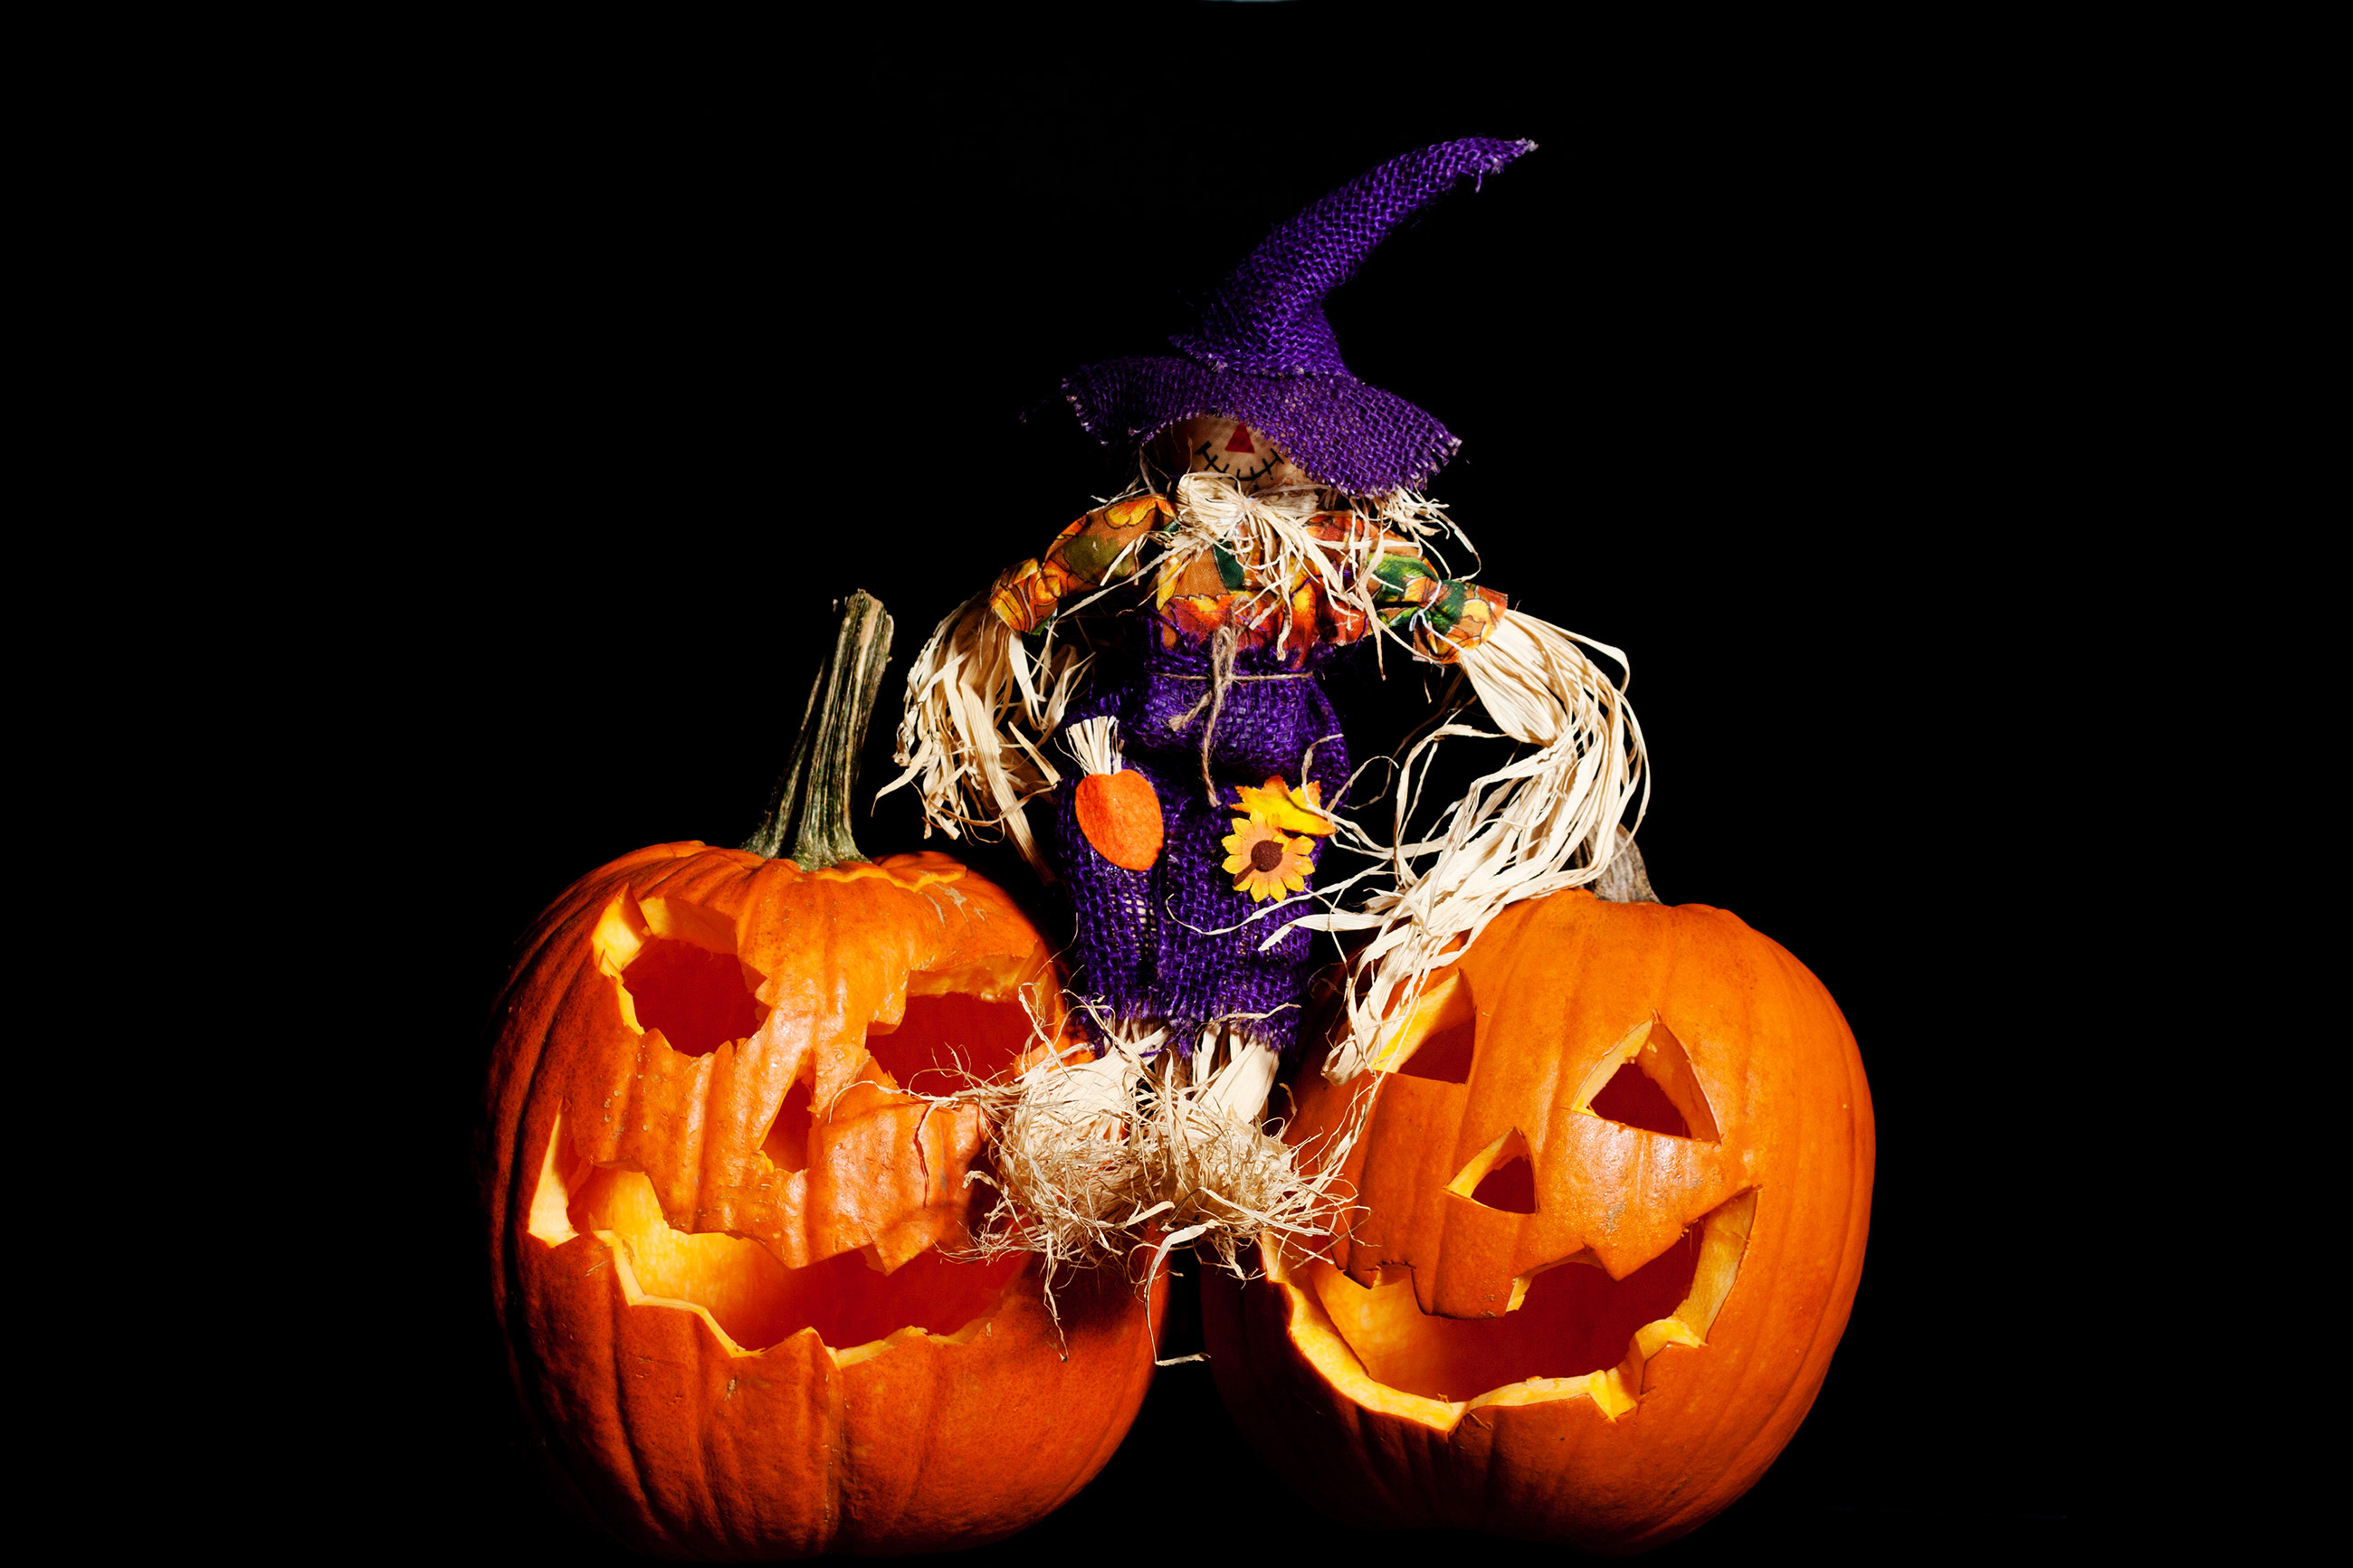 Scarecrow sitting on Pumpkins, Yellow, Lantern, Vegetable, Traditional, HQ Photo